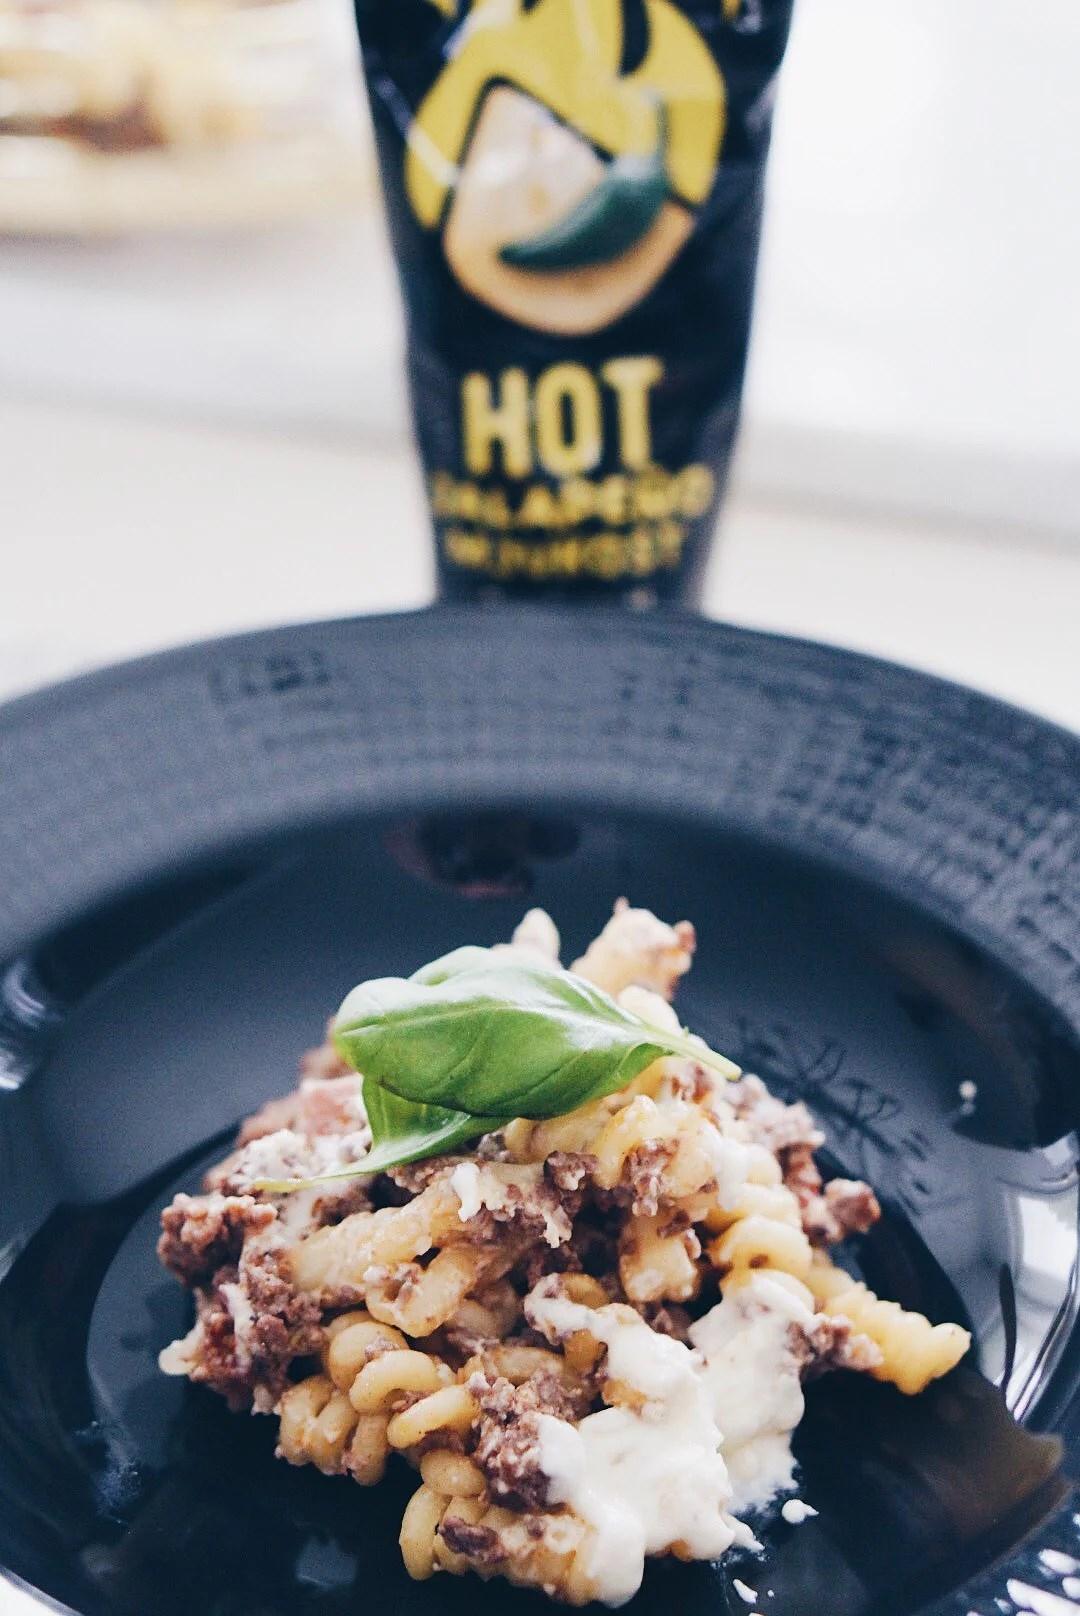 Pastagratäng med Hot Jalapeño mjukost